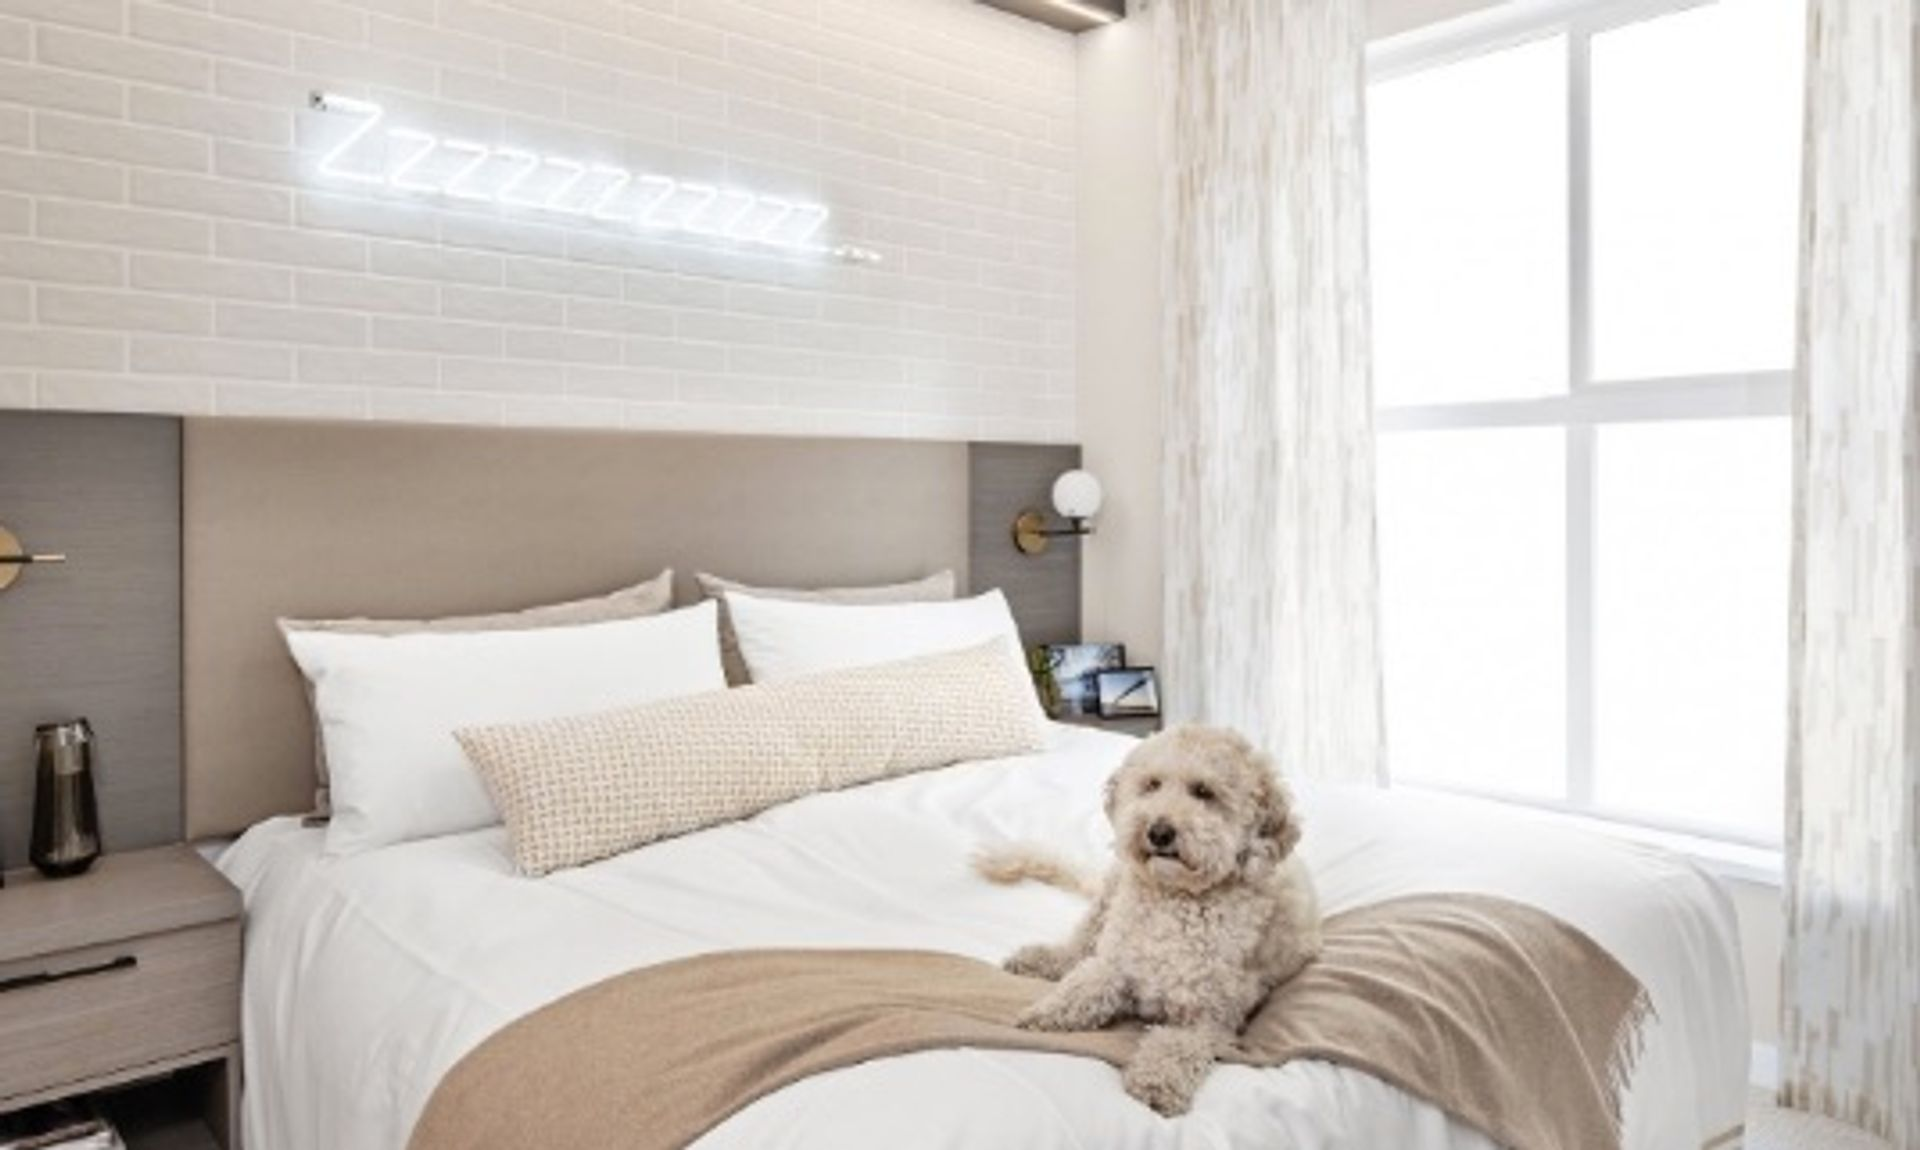 cardinal-bedroom-with-dog at Cardinal ( Adler Avenue, Coquitlam West, Coquitlam)